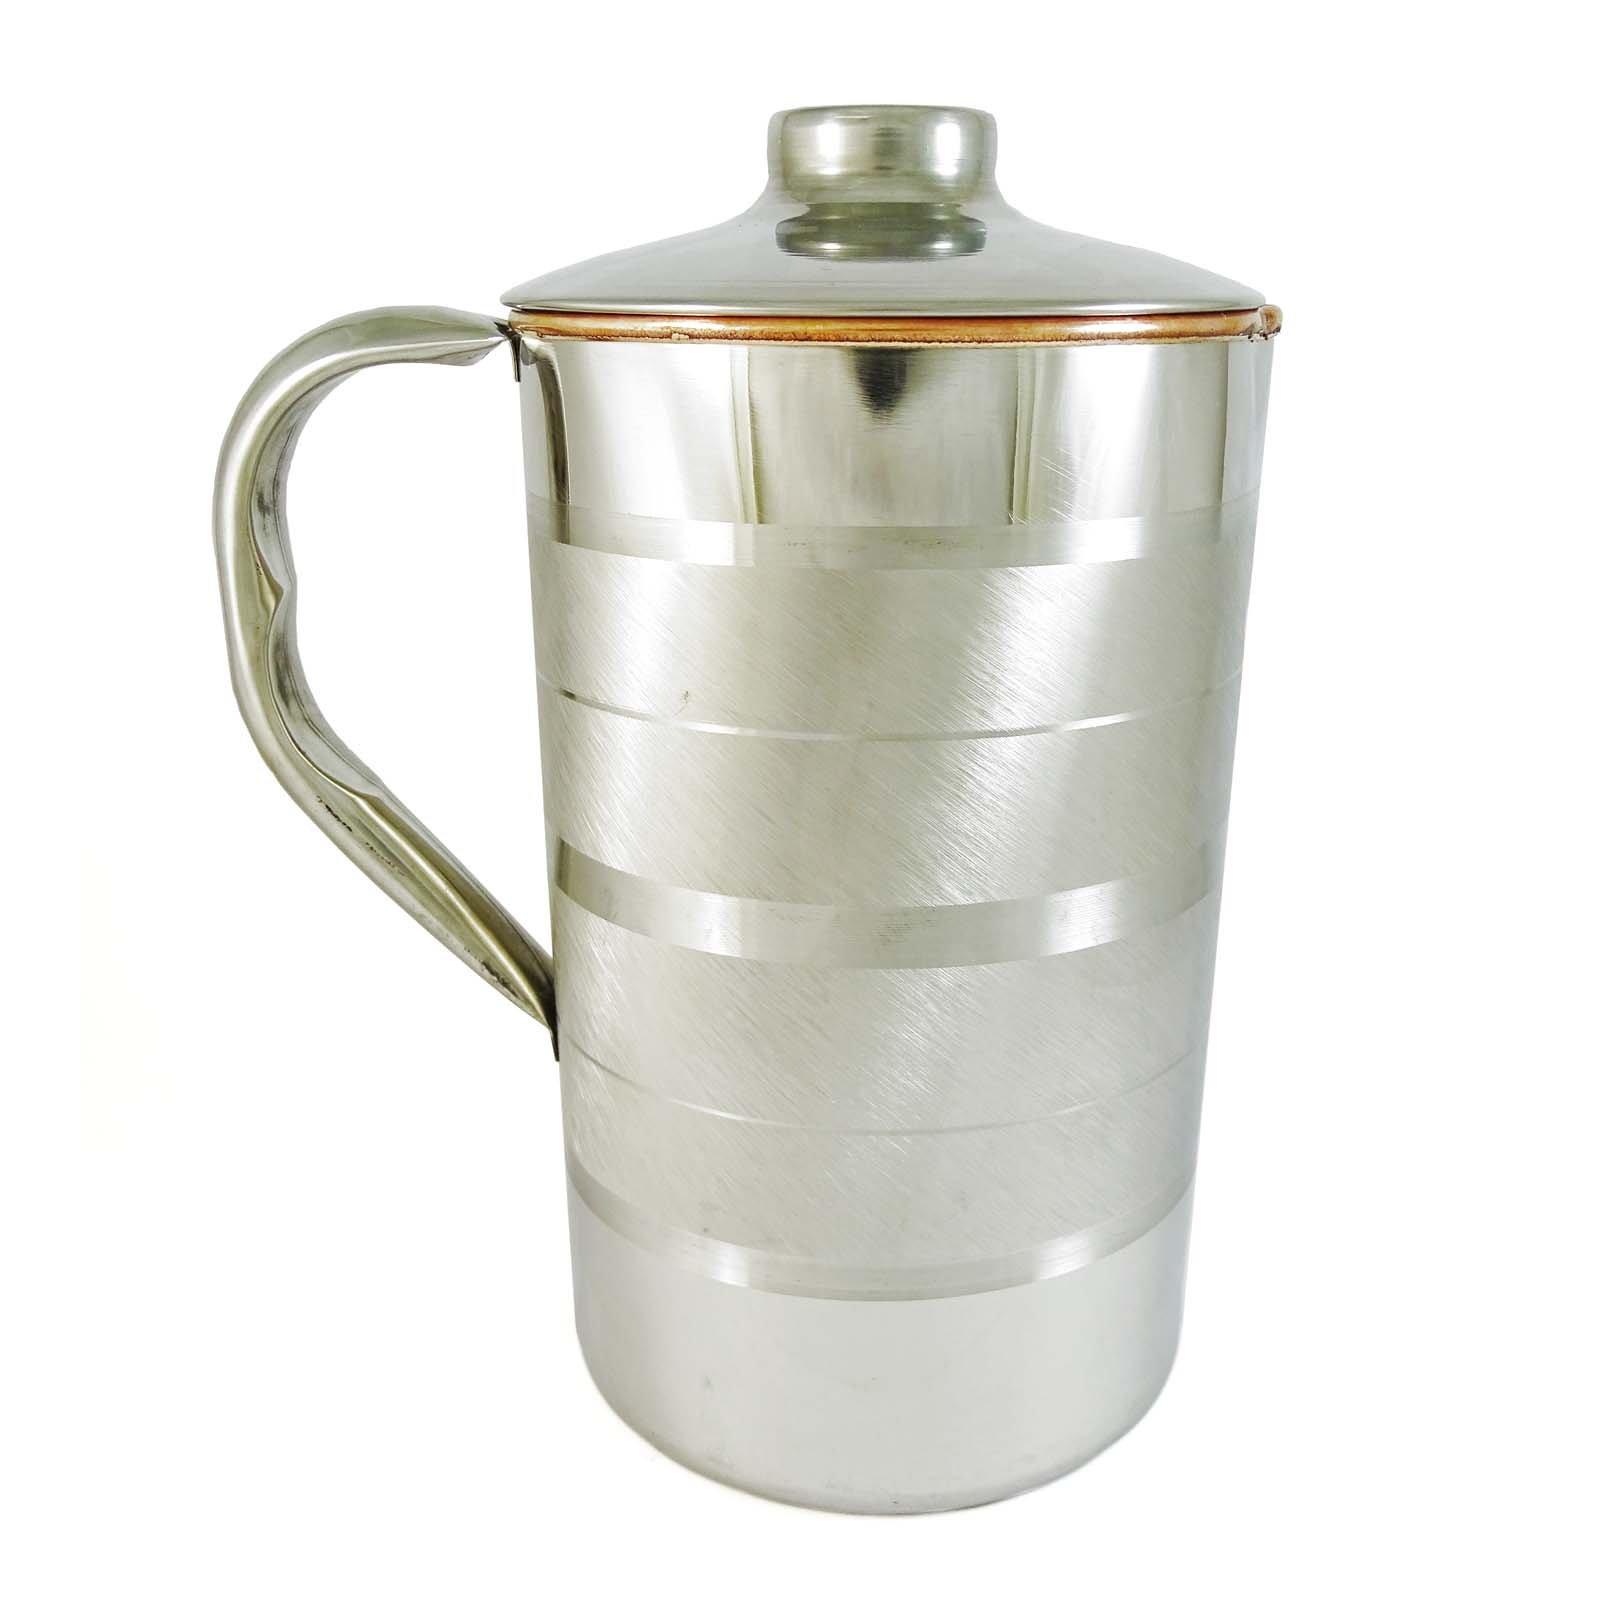 ibaexports Tableware Traditional Serving Ayurvedic Copper Steel Kitchenware Water Jug by ibaexports (Image #3)